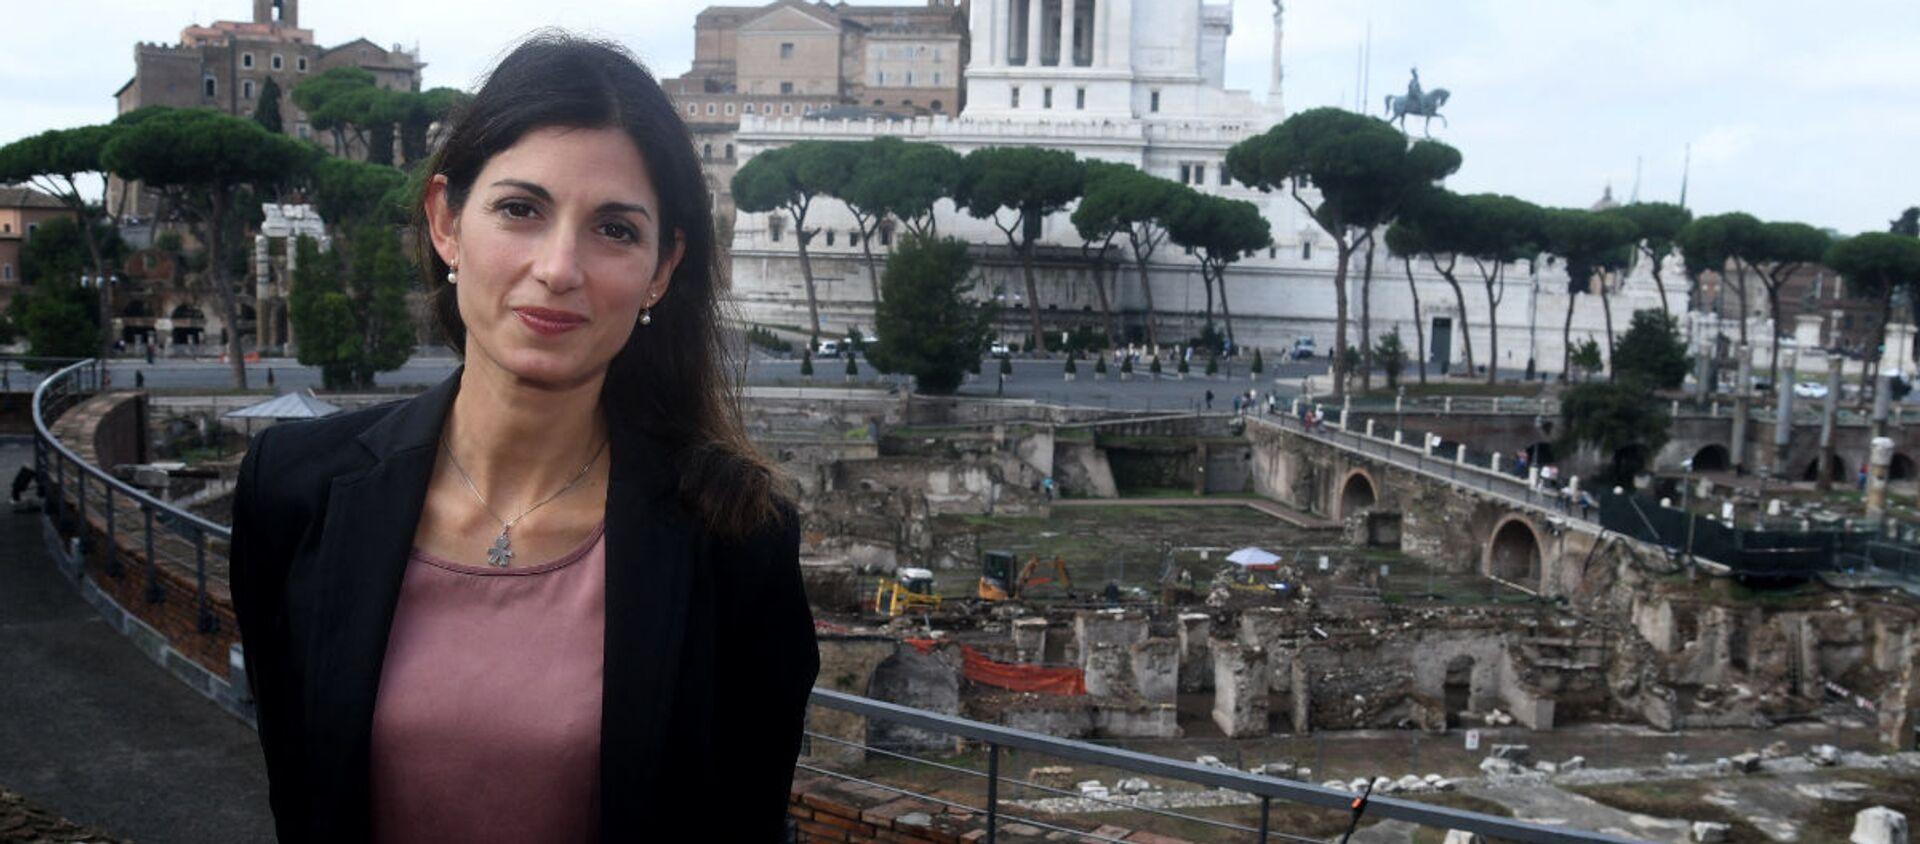 Virginia Raggi, sindaco di Roma Capitale - Sputnik Italia, 1920, 09.05.2021